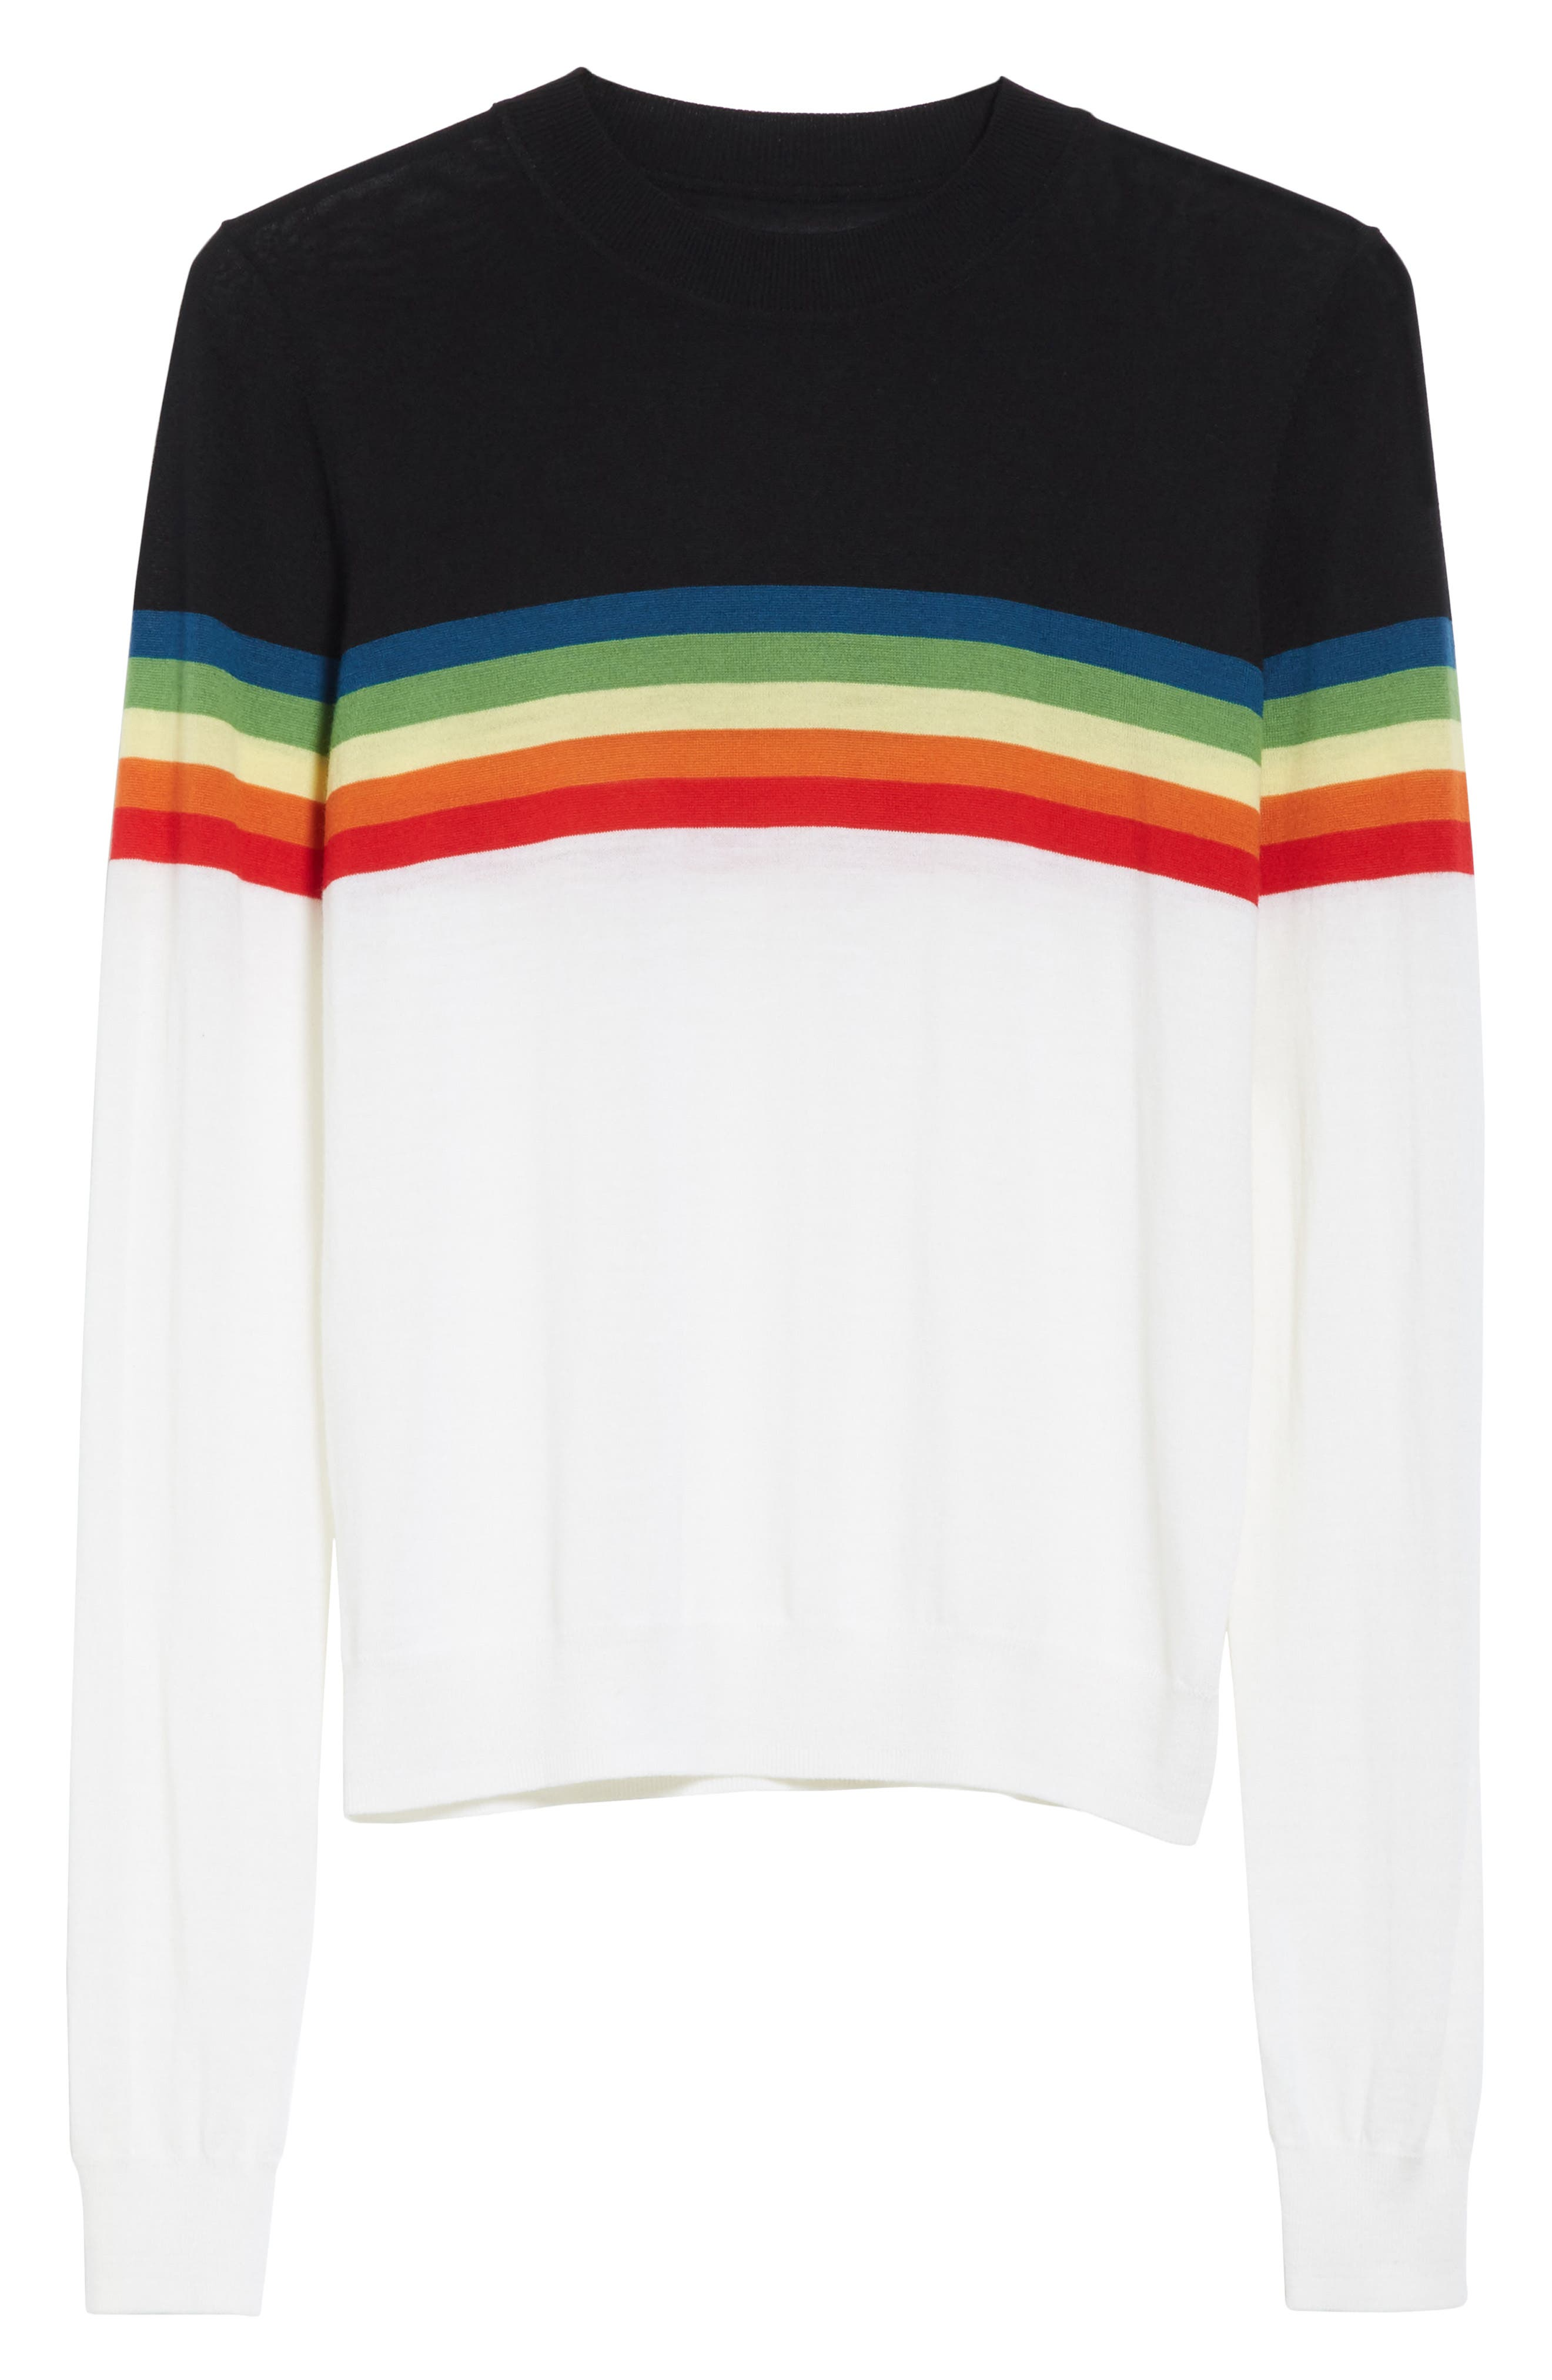 Diane von Furstenberg Rainbow Sweater,                             Alternate thumbnail 6, color,                             107